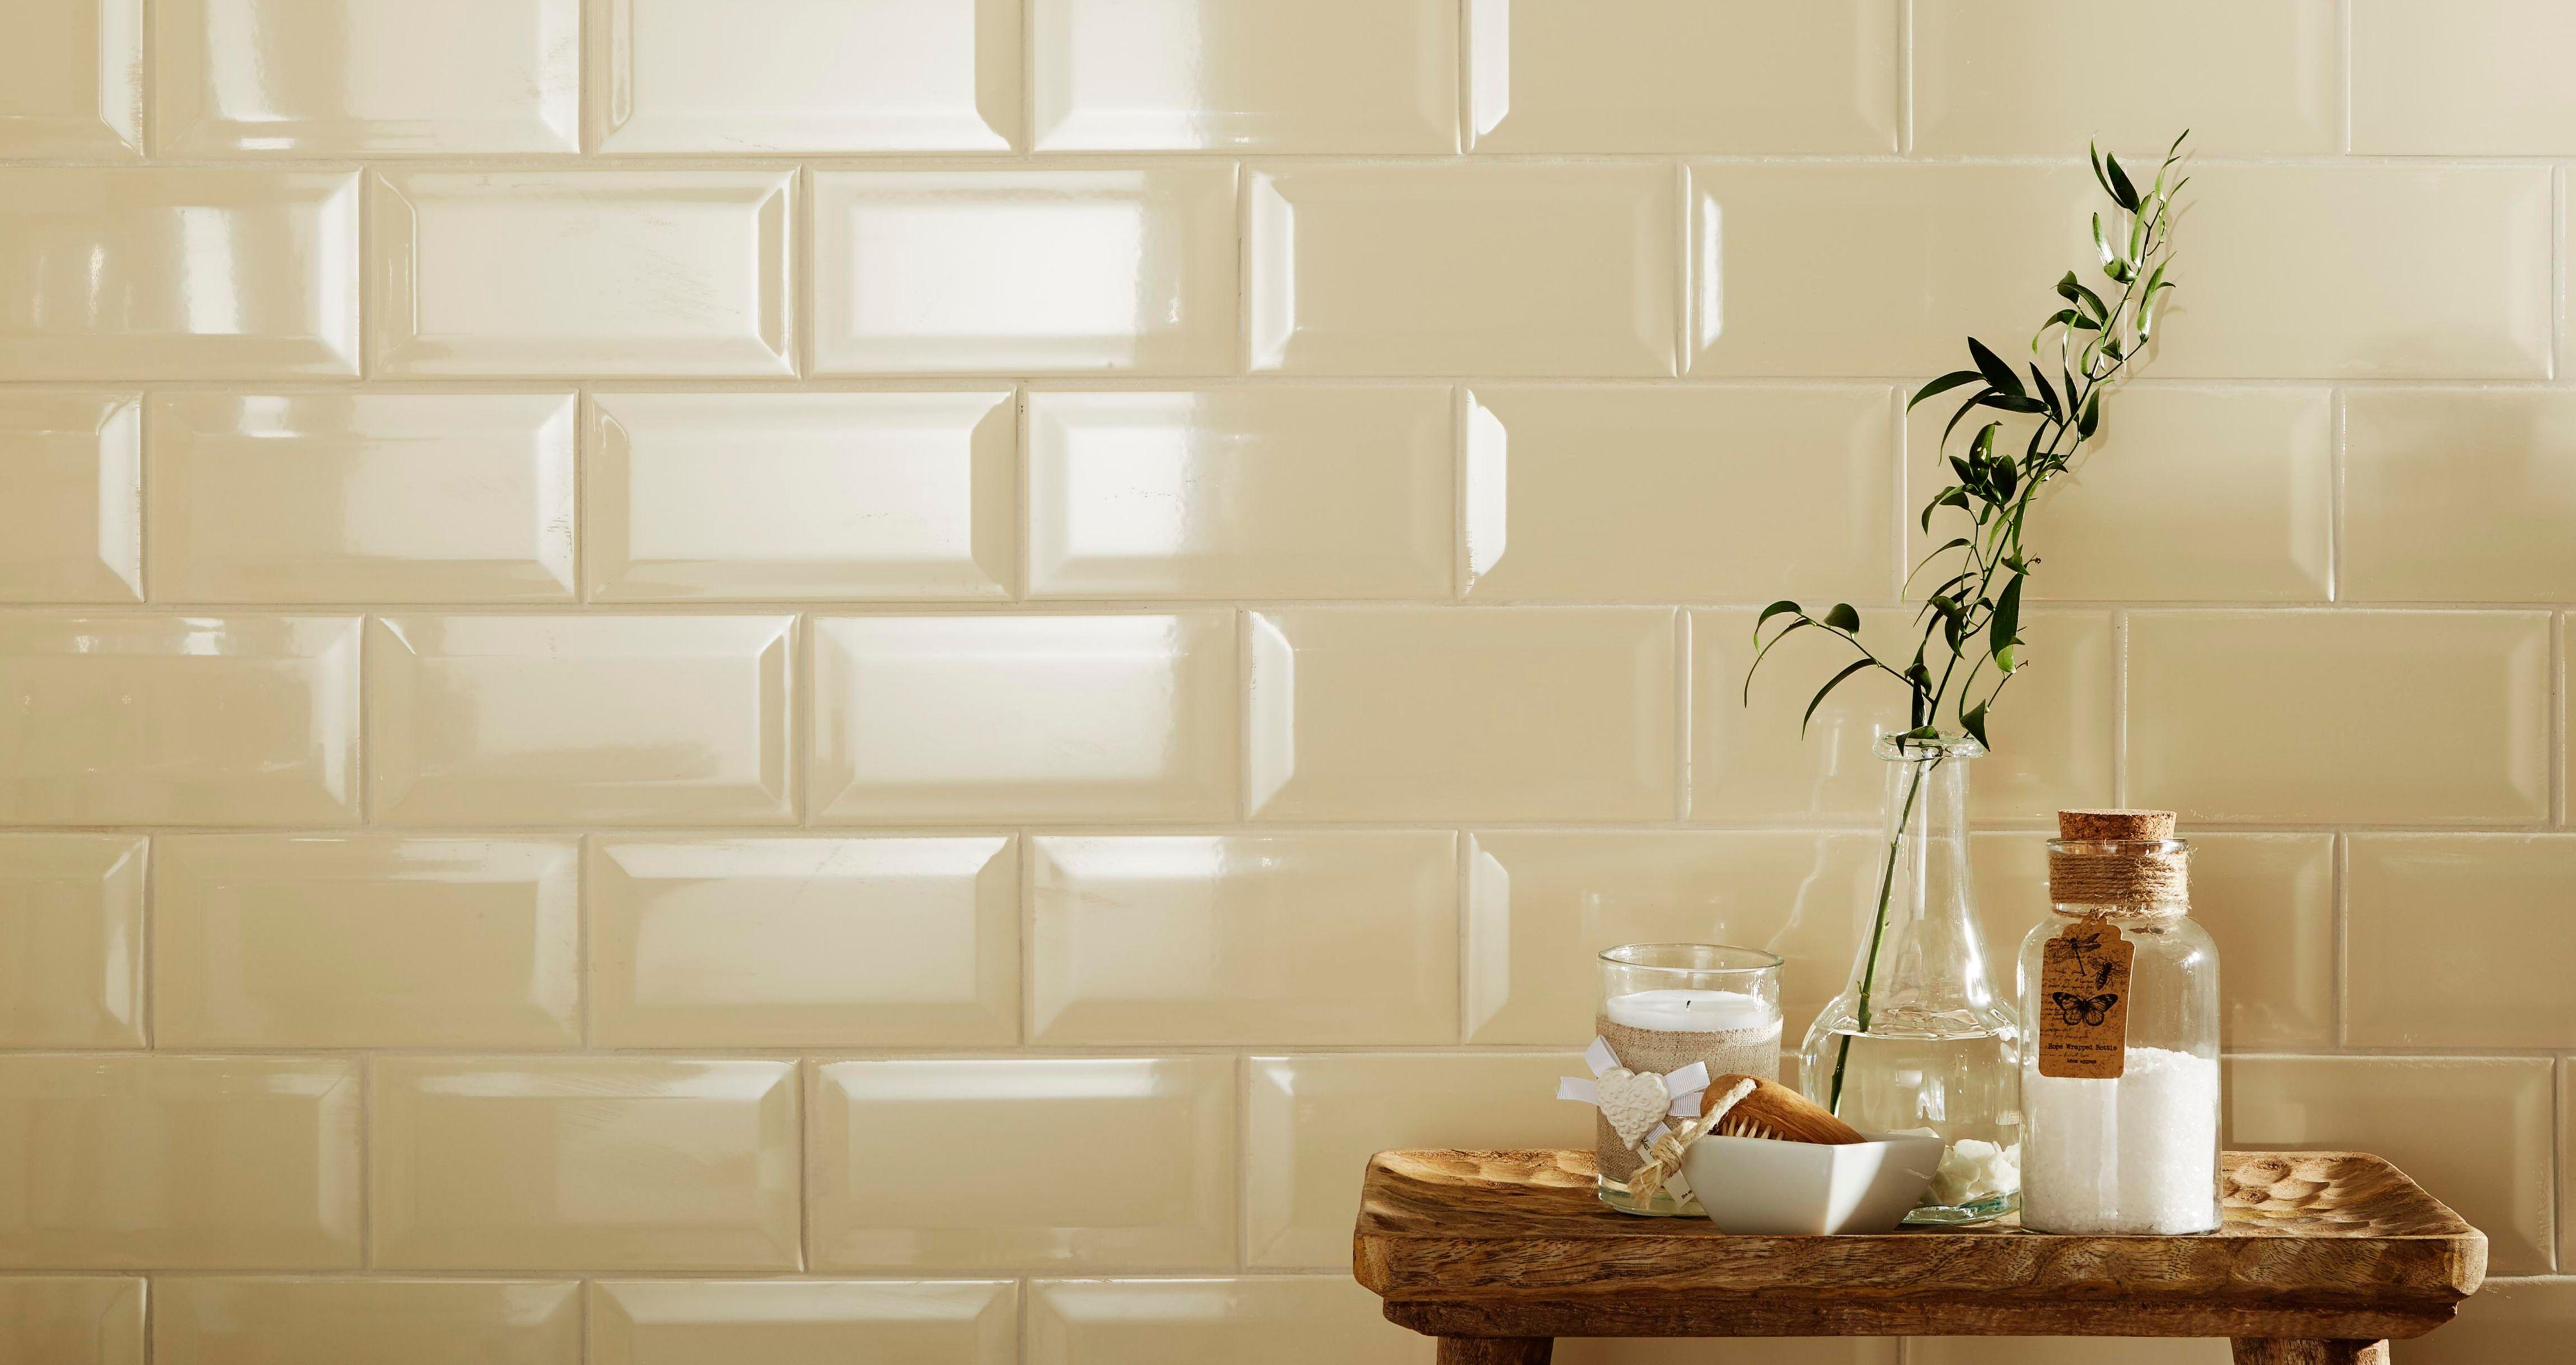 3d Peel And Stick Brick Wallpaper سرامیک تراورتن و راهنمای خرید و نصب سرامیک طرح سنگ تراورتن